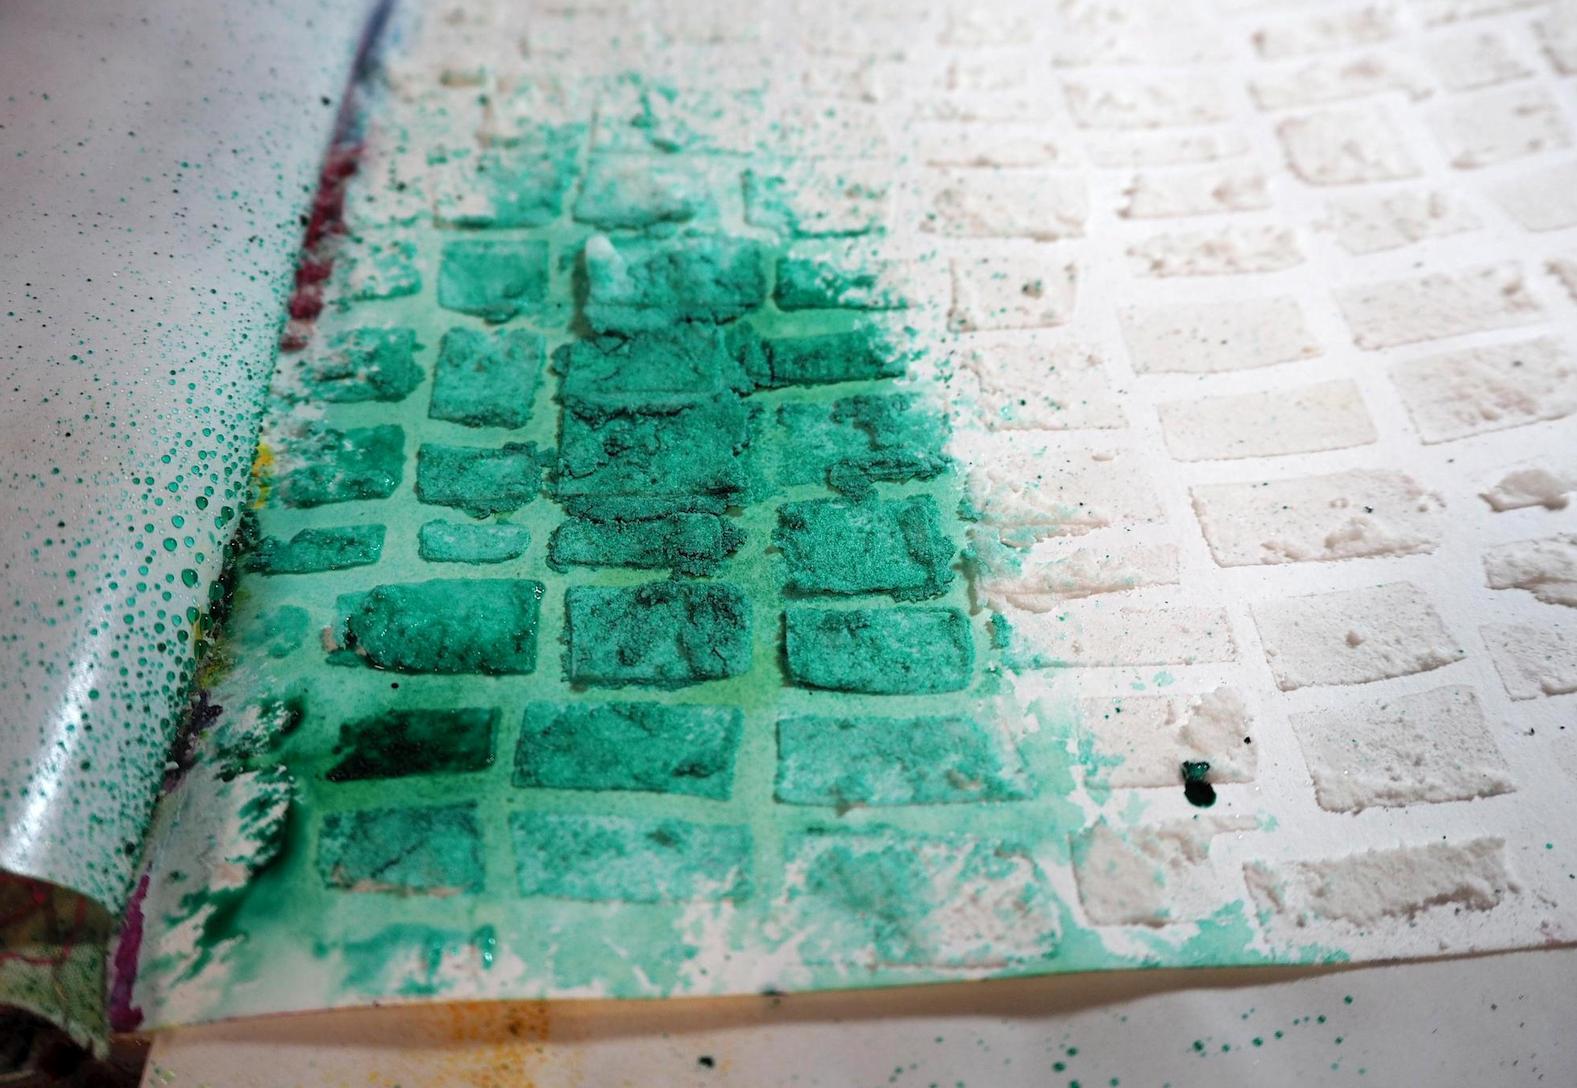 Testing a spray dye - Adirondack in Bottle Green